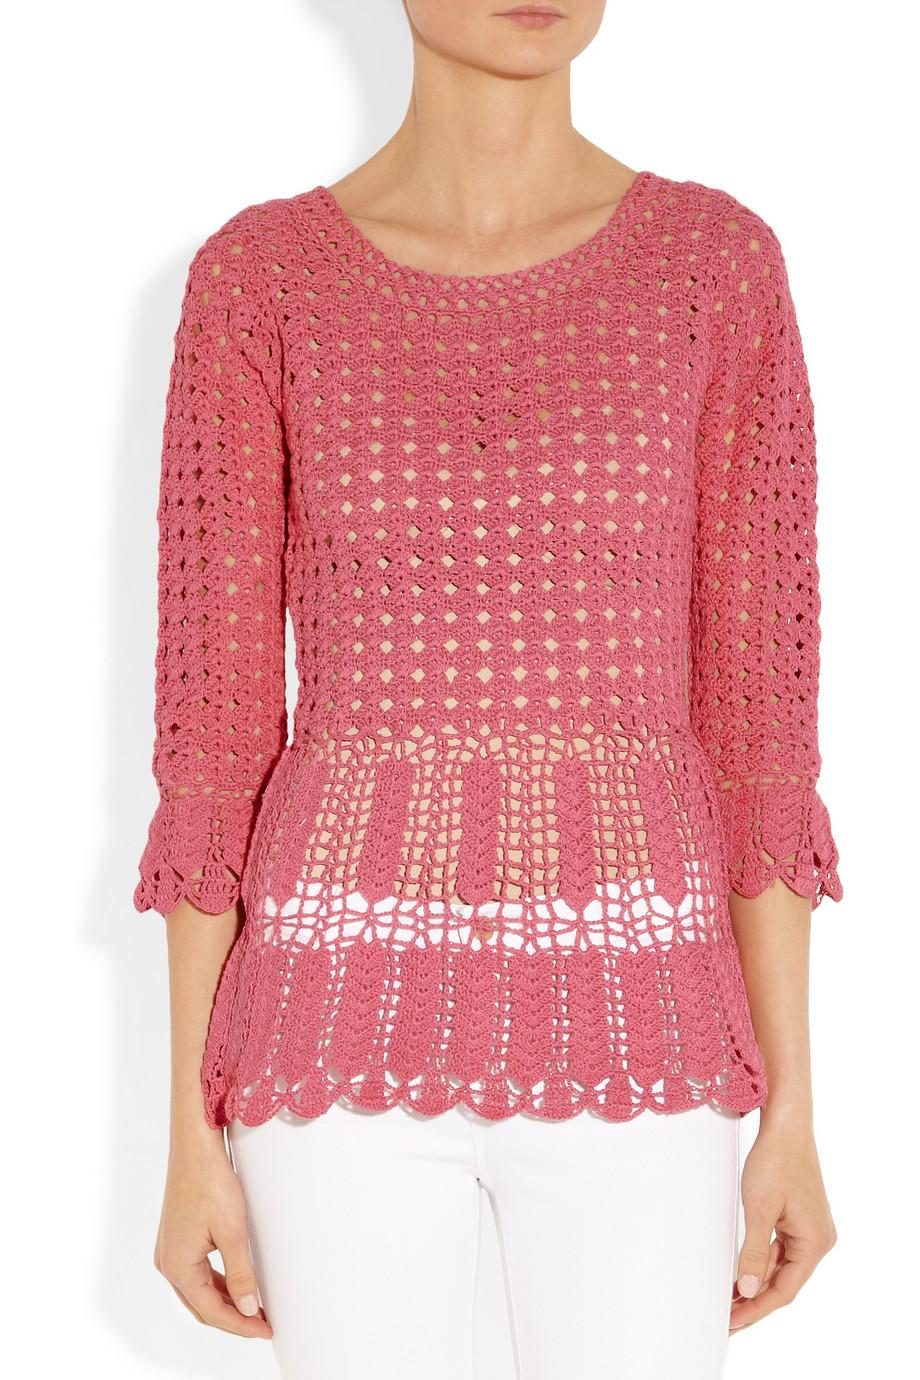 Lyst Alberta Ferretti Crocheted Cotton Peplum Top In Pink